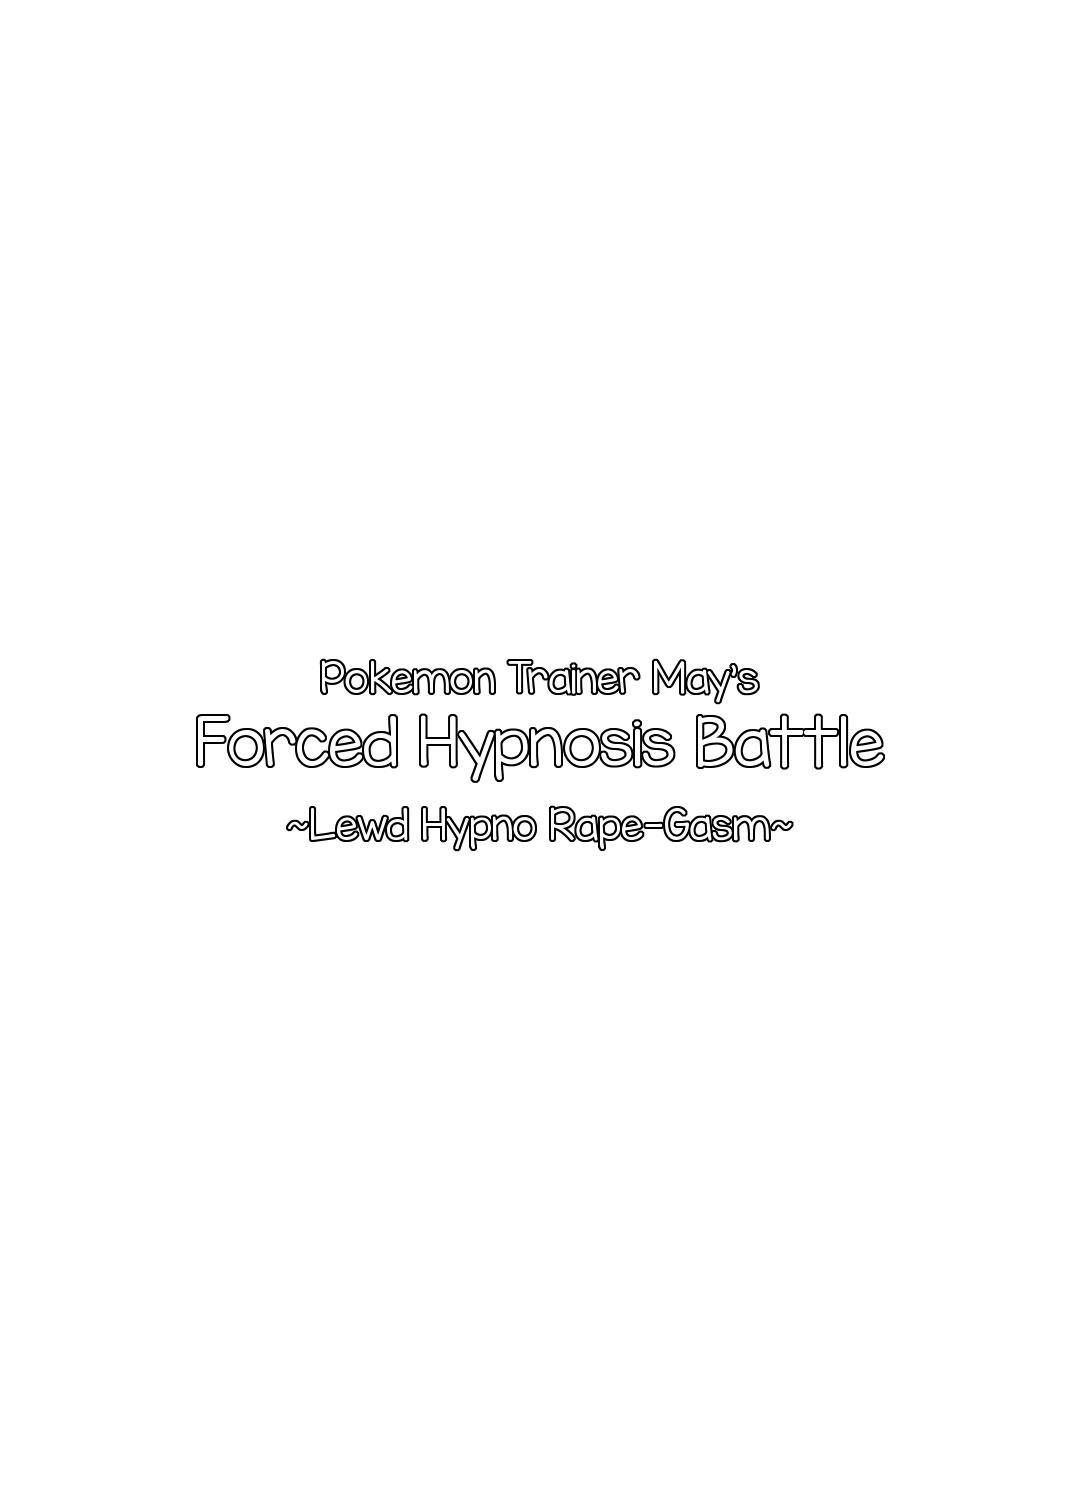 Pokemon Trainer Haruka Kyousei Saimin Battle   Pokemon Trainer May's Forced Hypnosis Battle 2